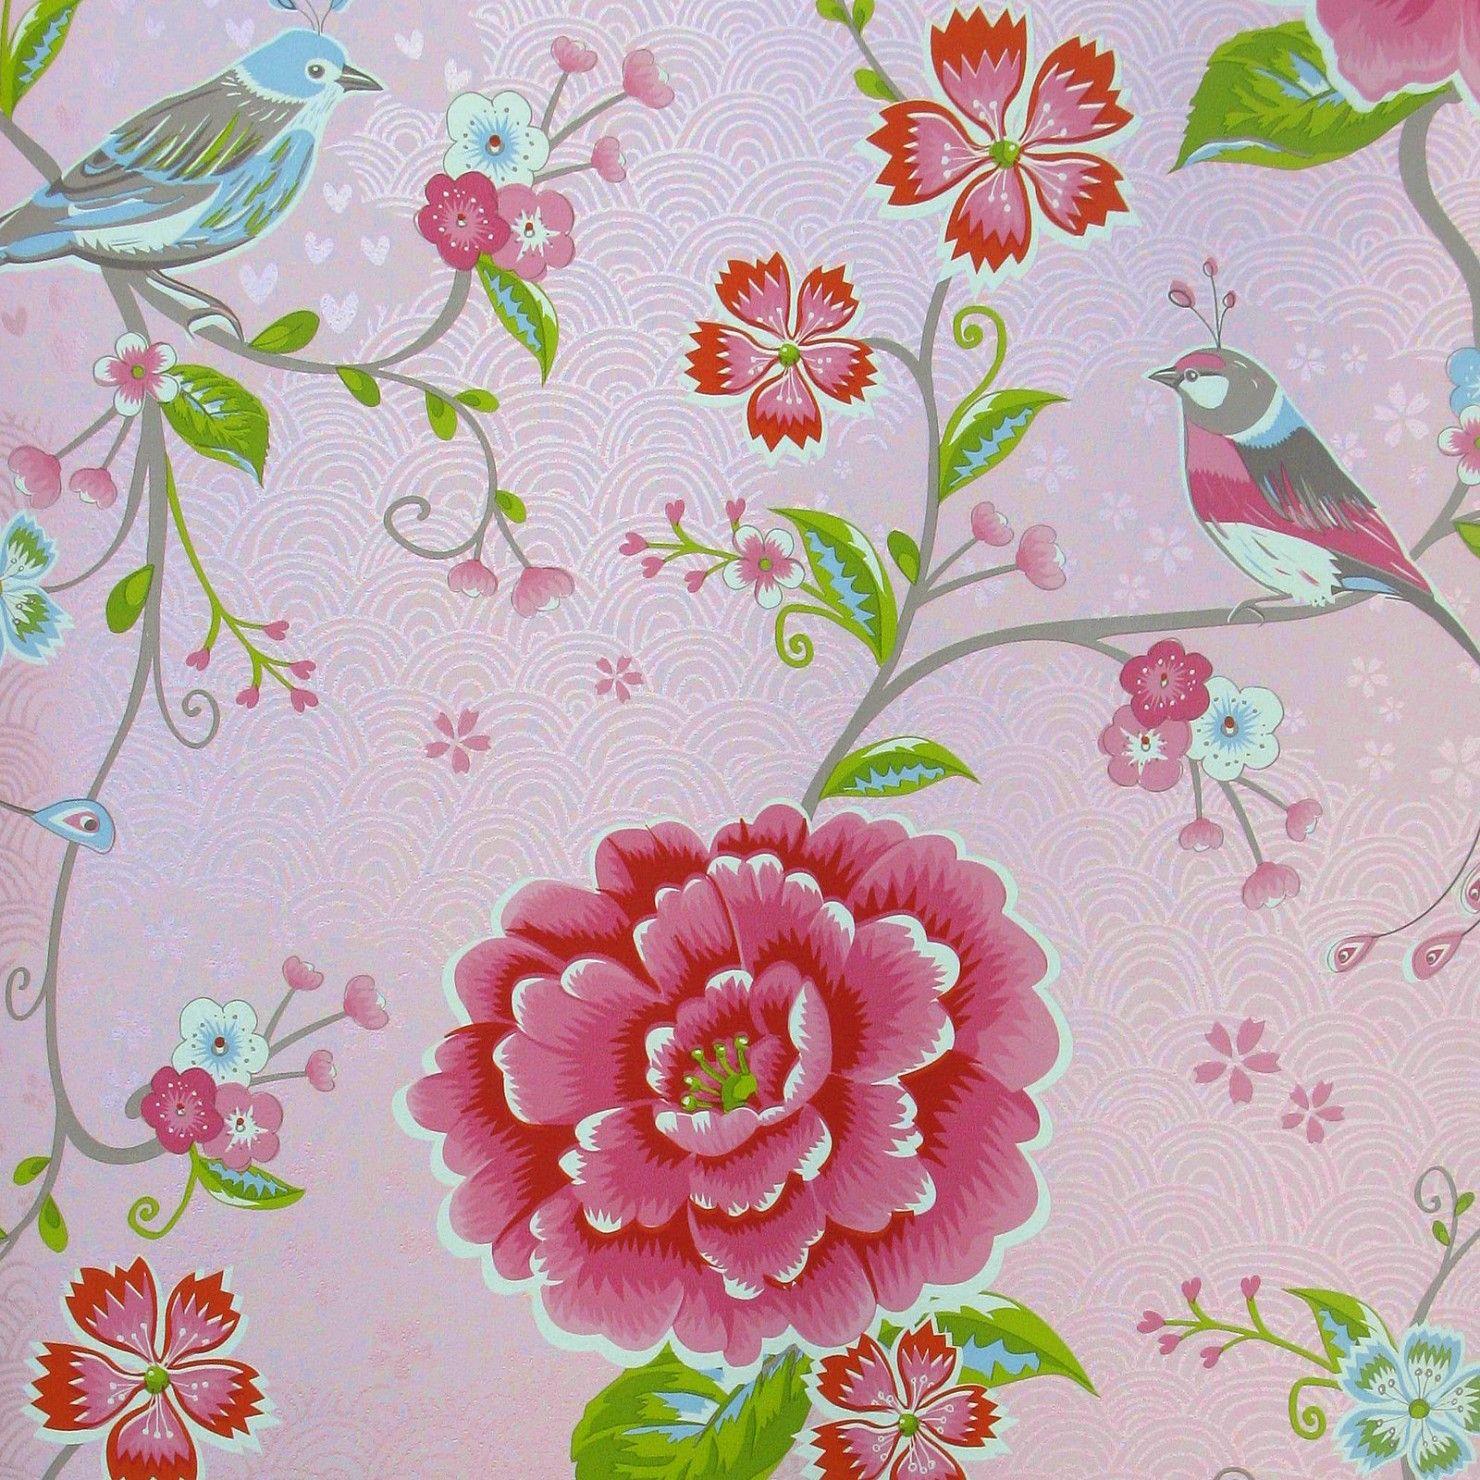 Pip Studio Behang Birds In Paradise Roze Behangnr 313010